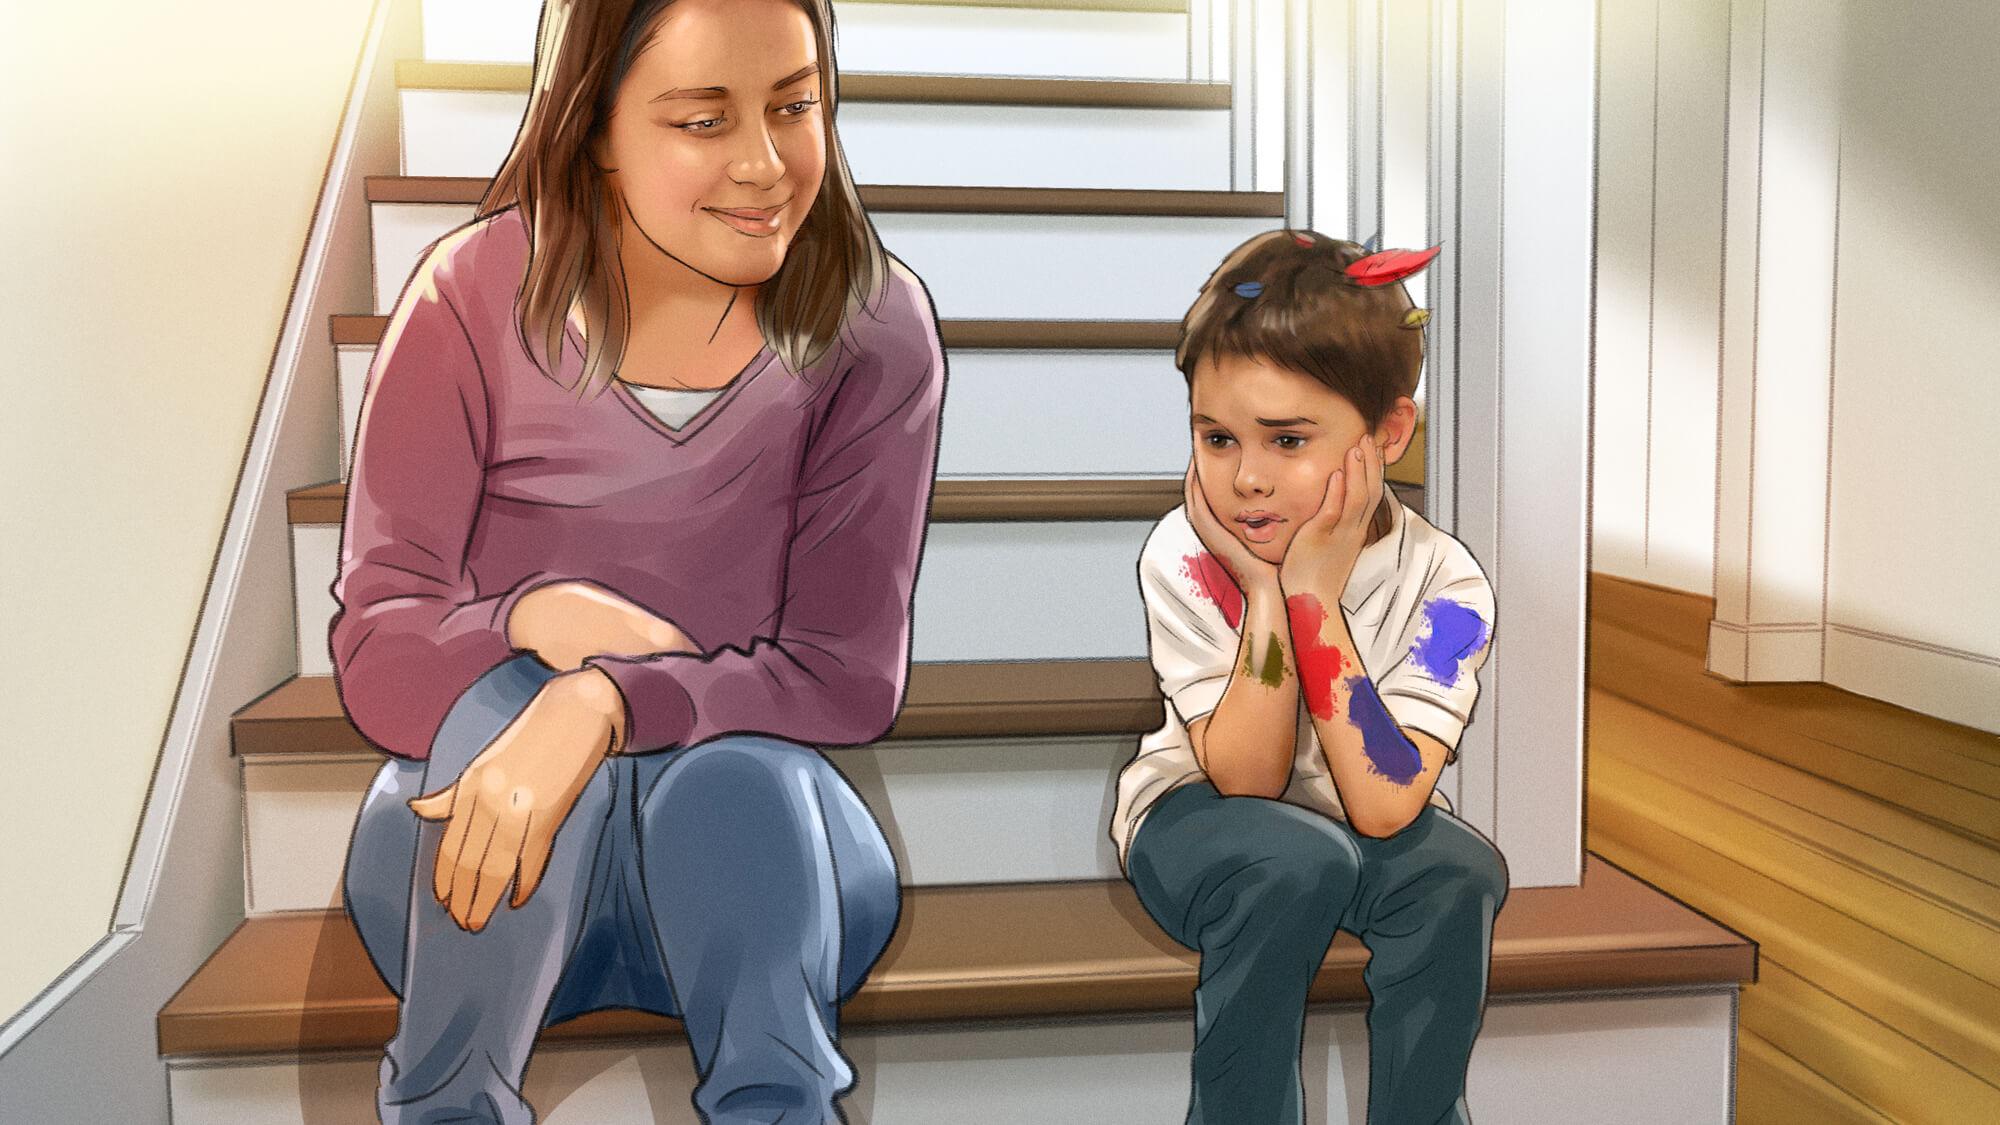 Kinder_Storyboard_4.jpg